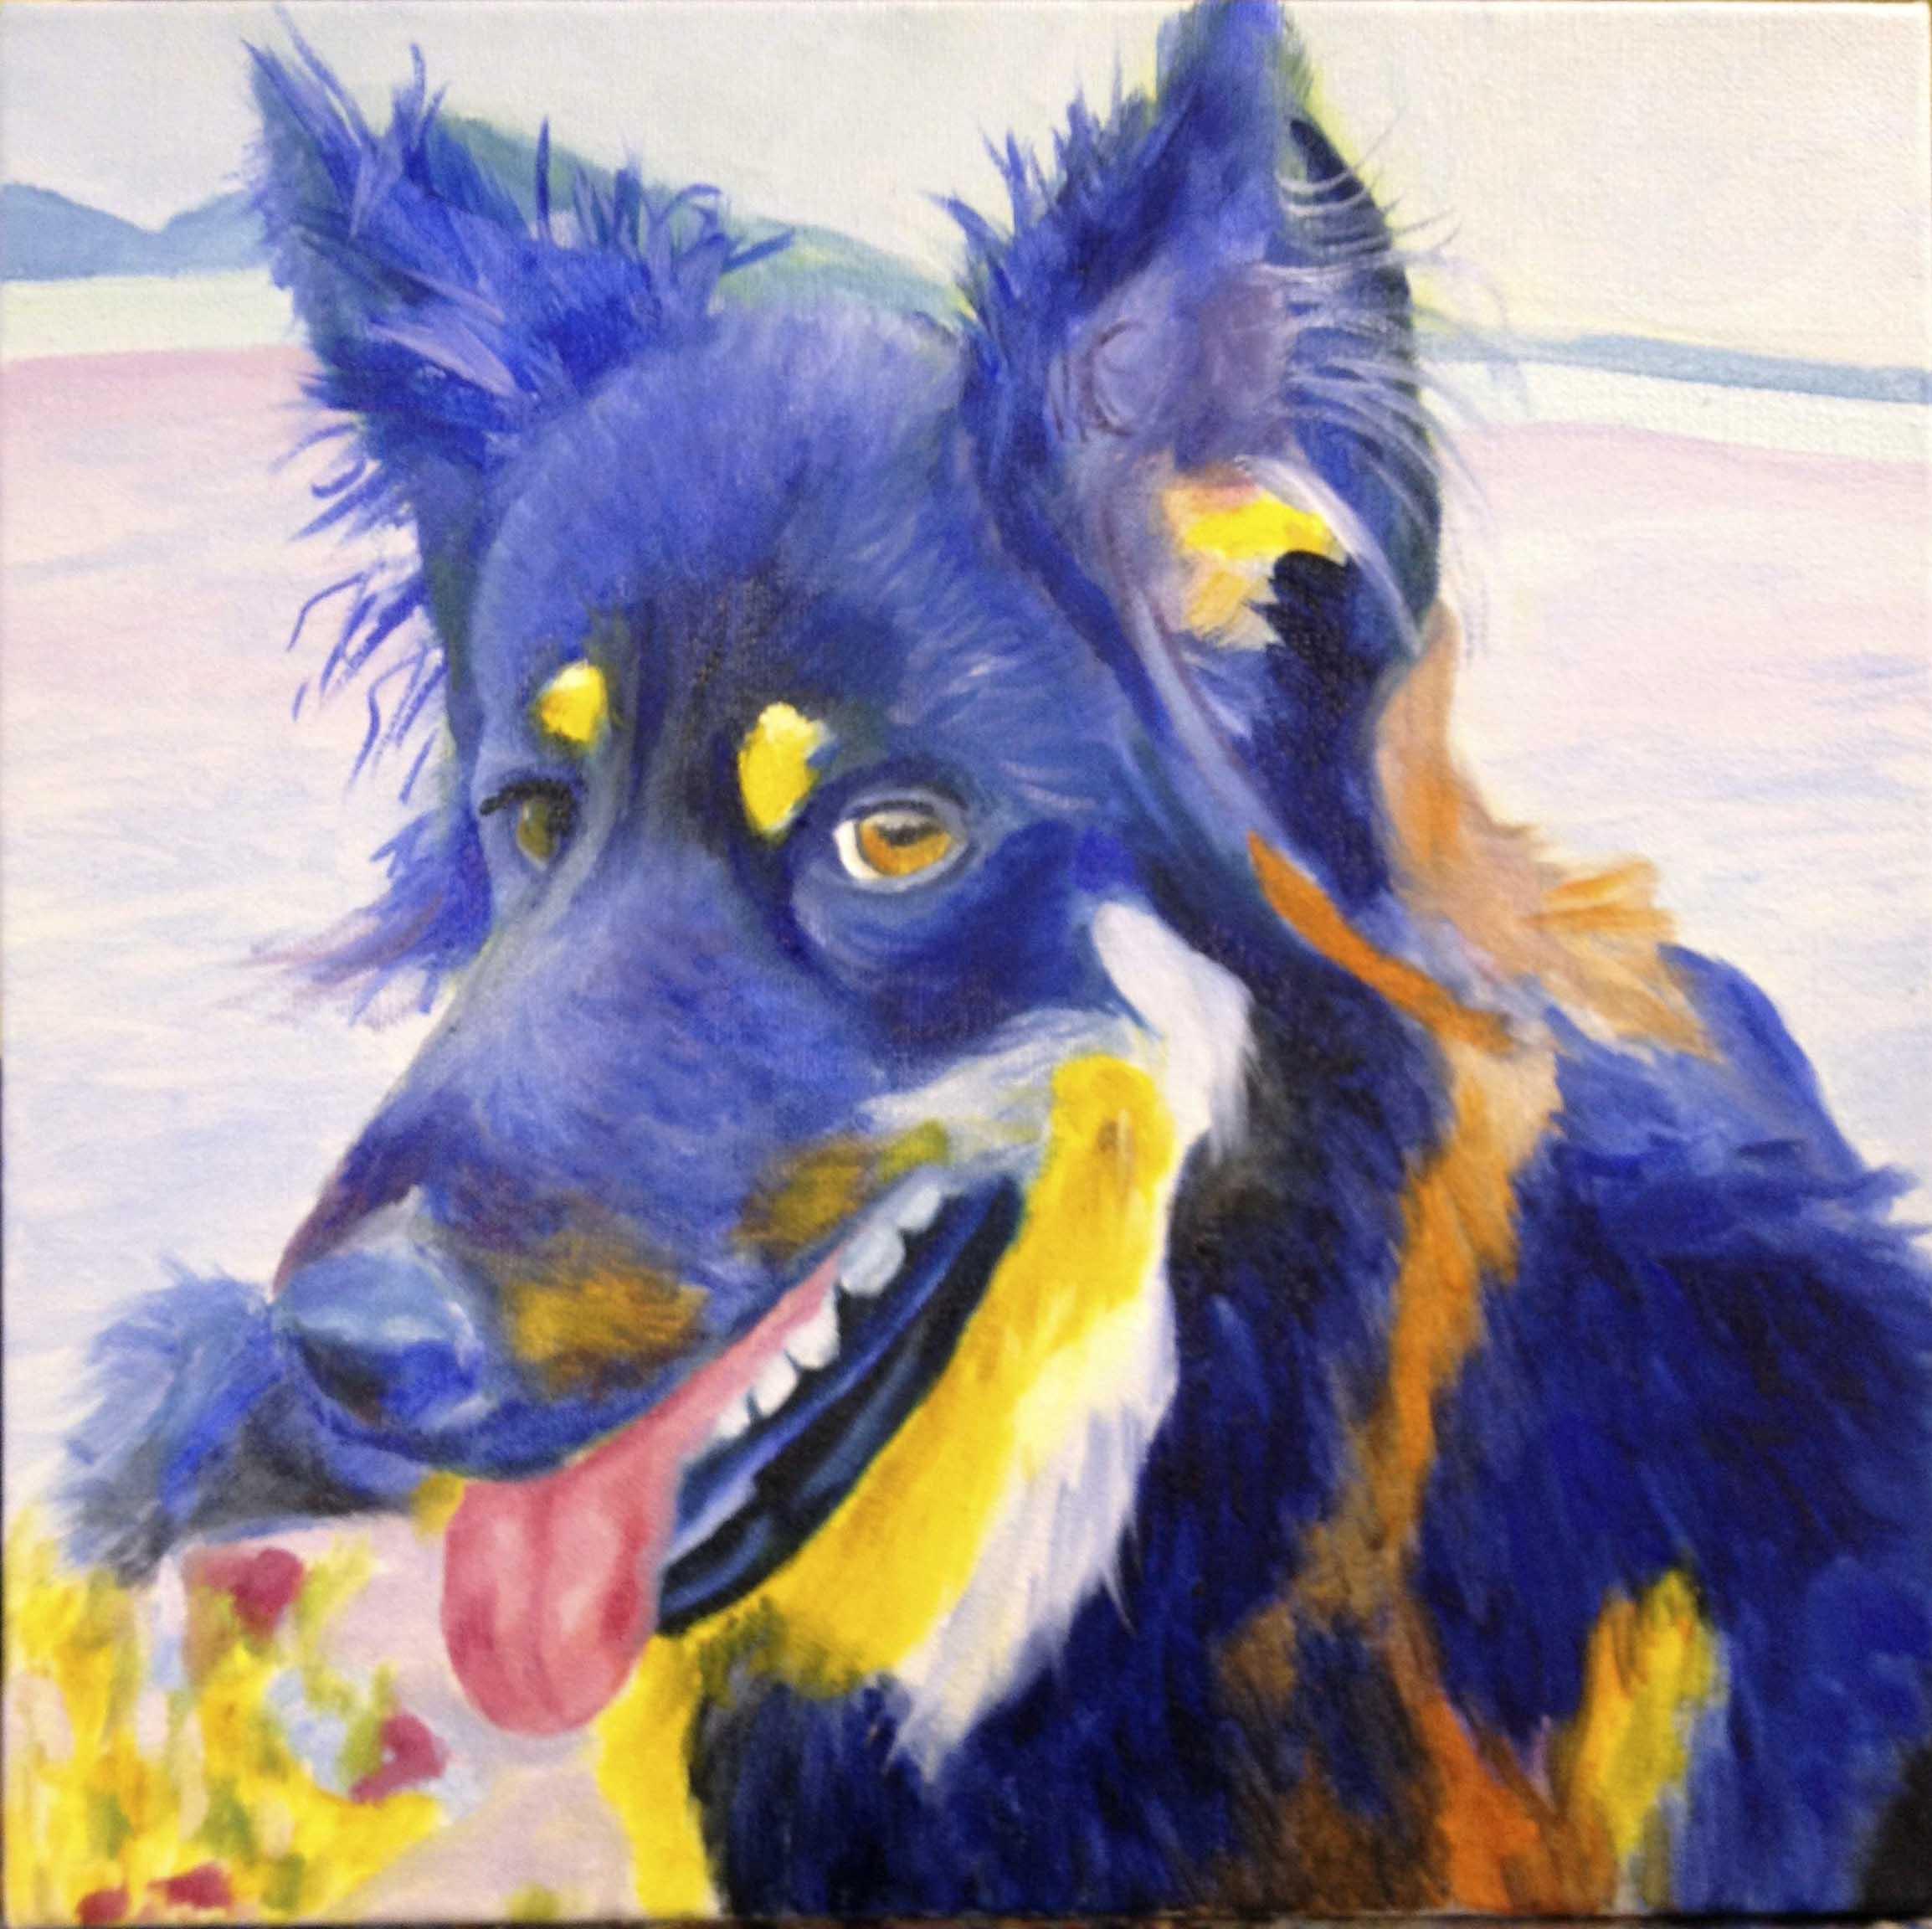 Ethan's Dog